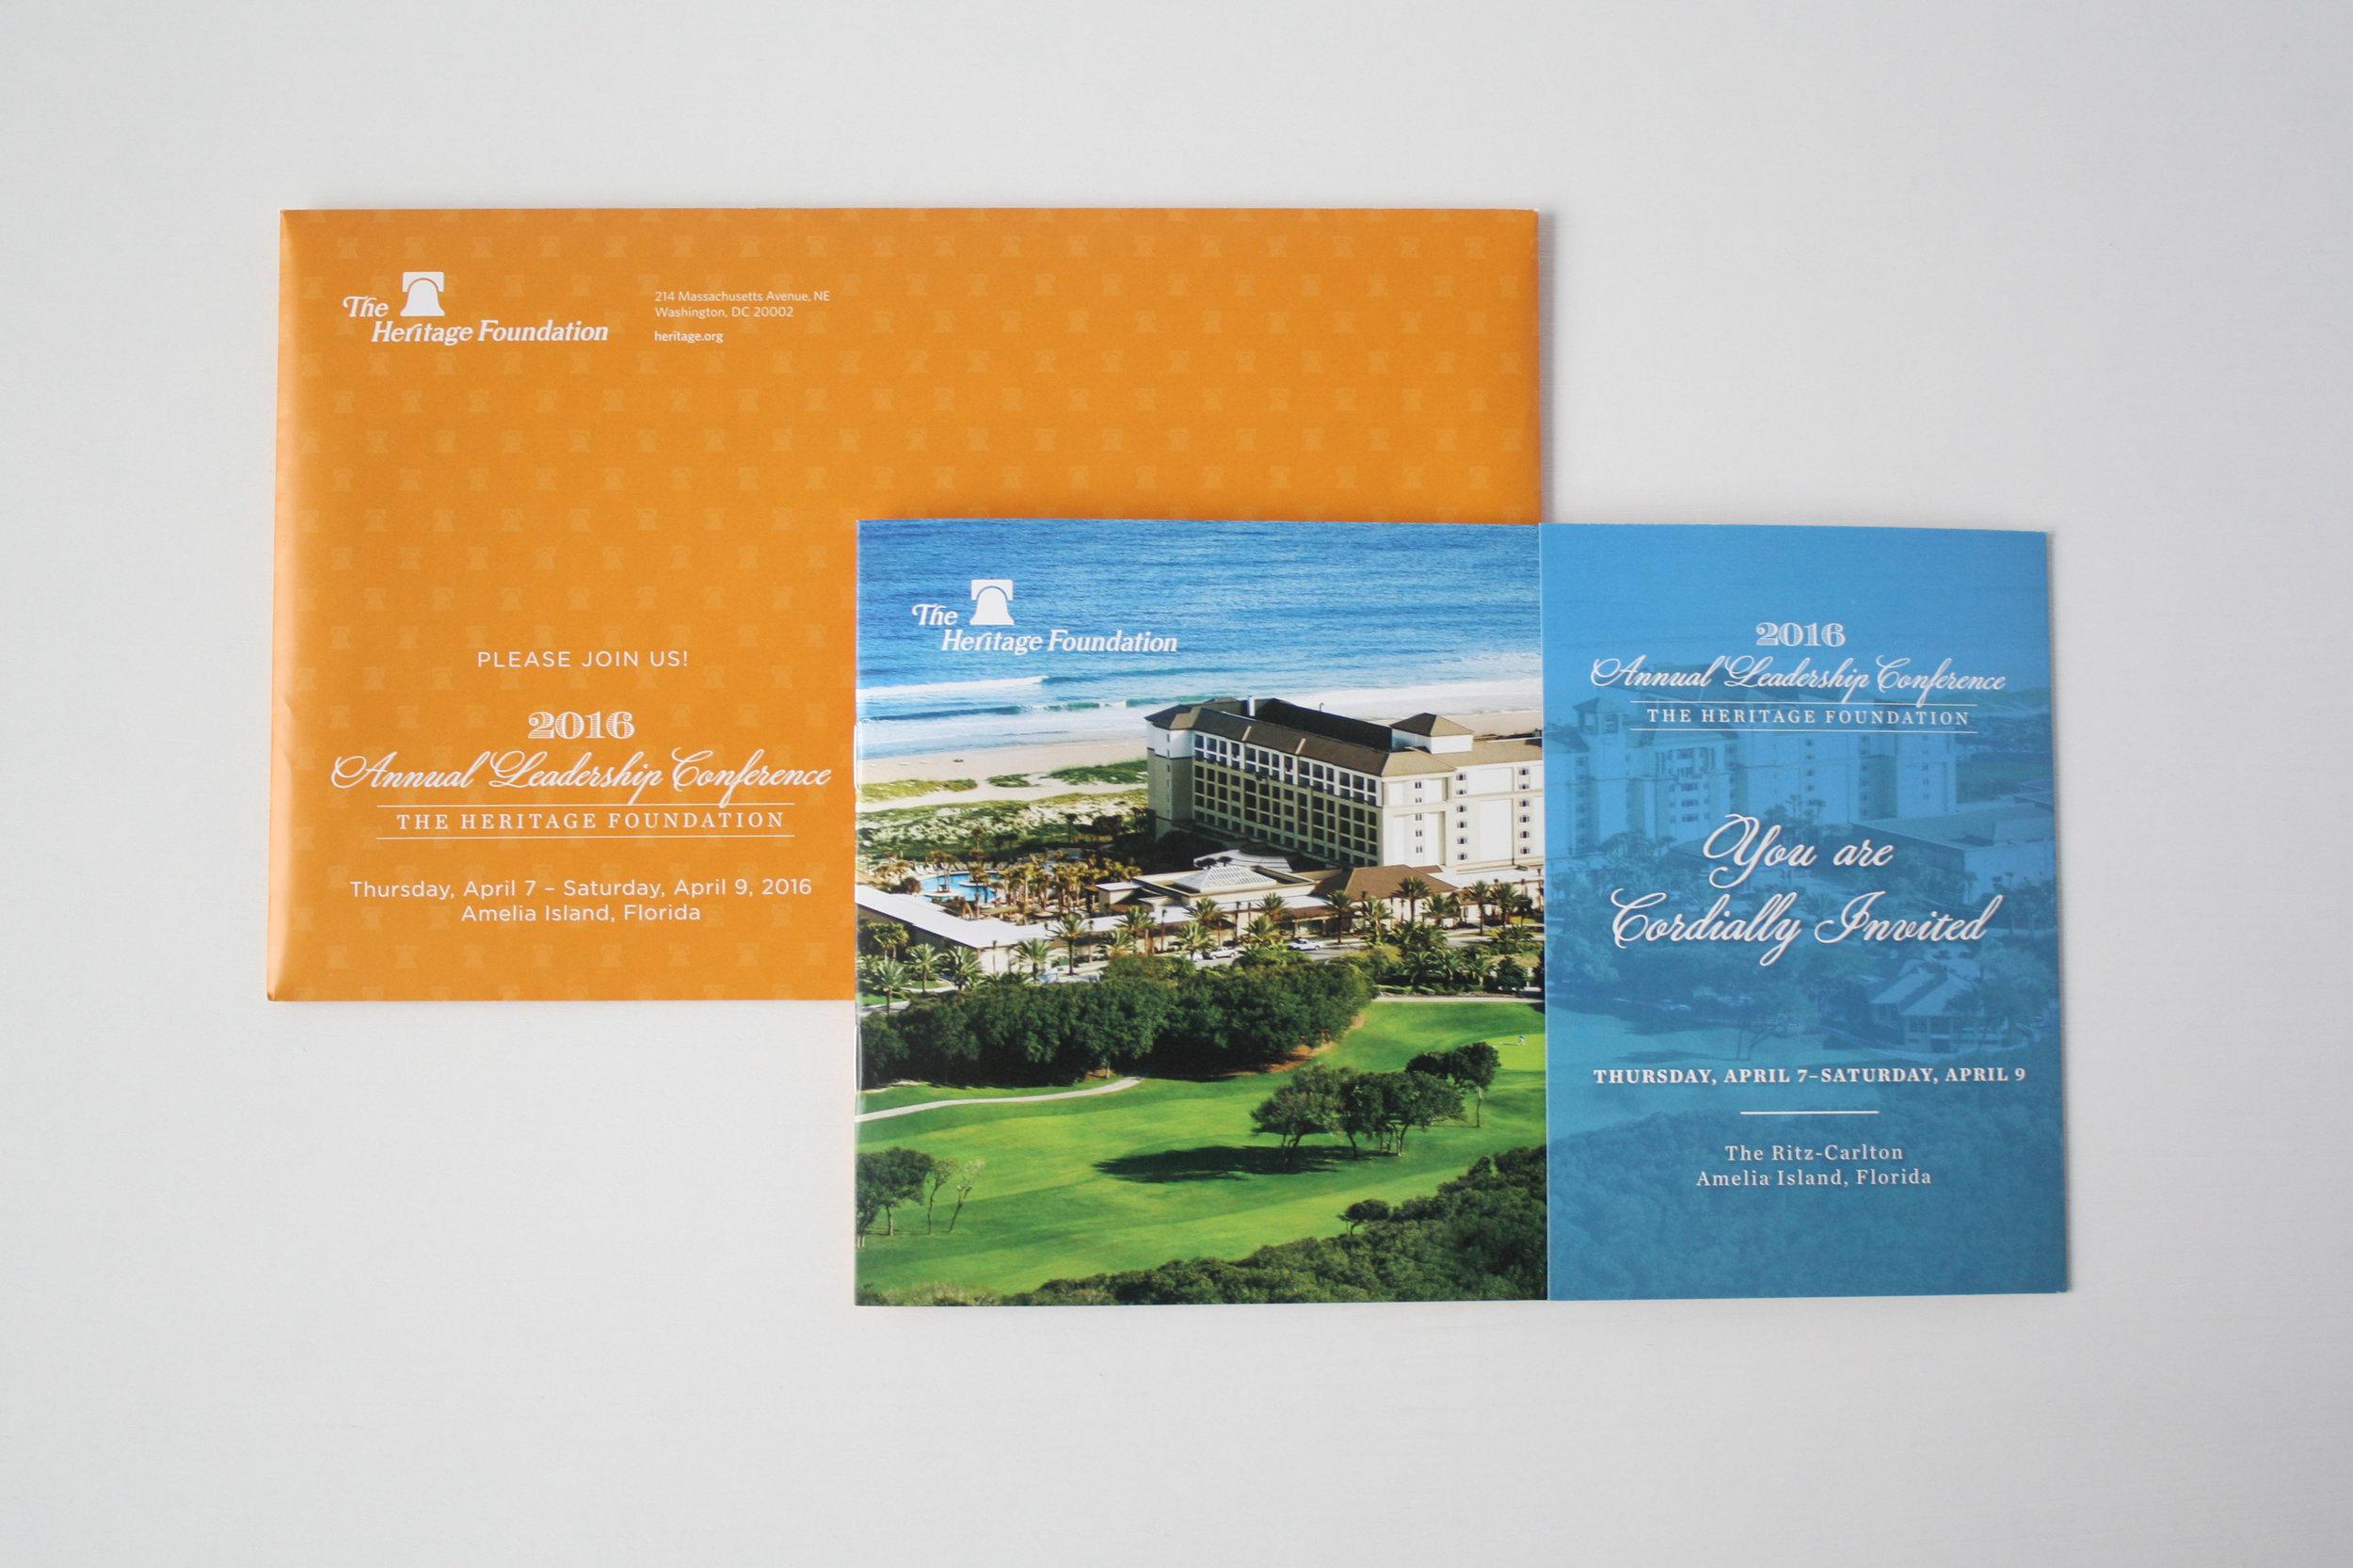 Annual Leadership Conference Invitation | Casi Long Design | casilong.com:portfolio | #casilongdesign #fearlesspursuit 6.jpg